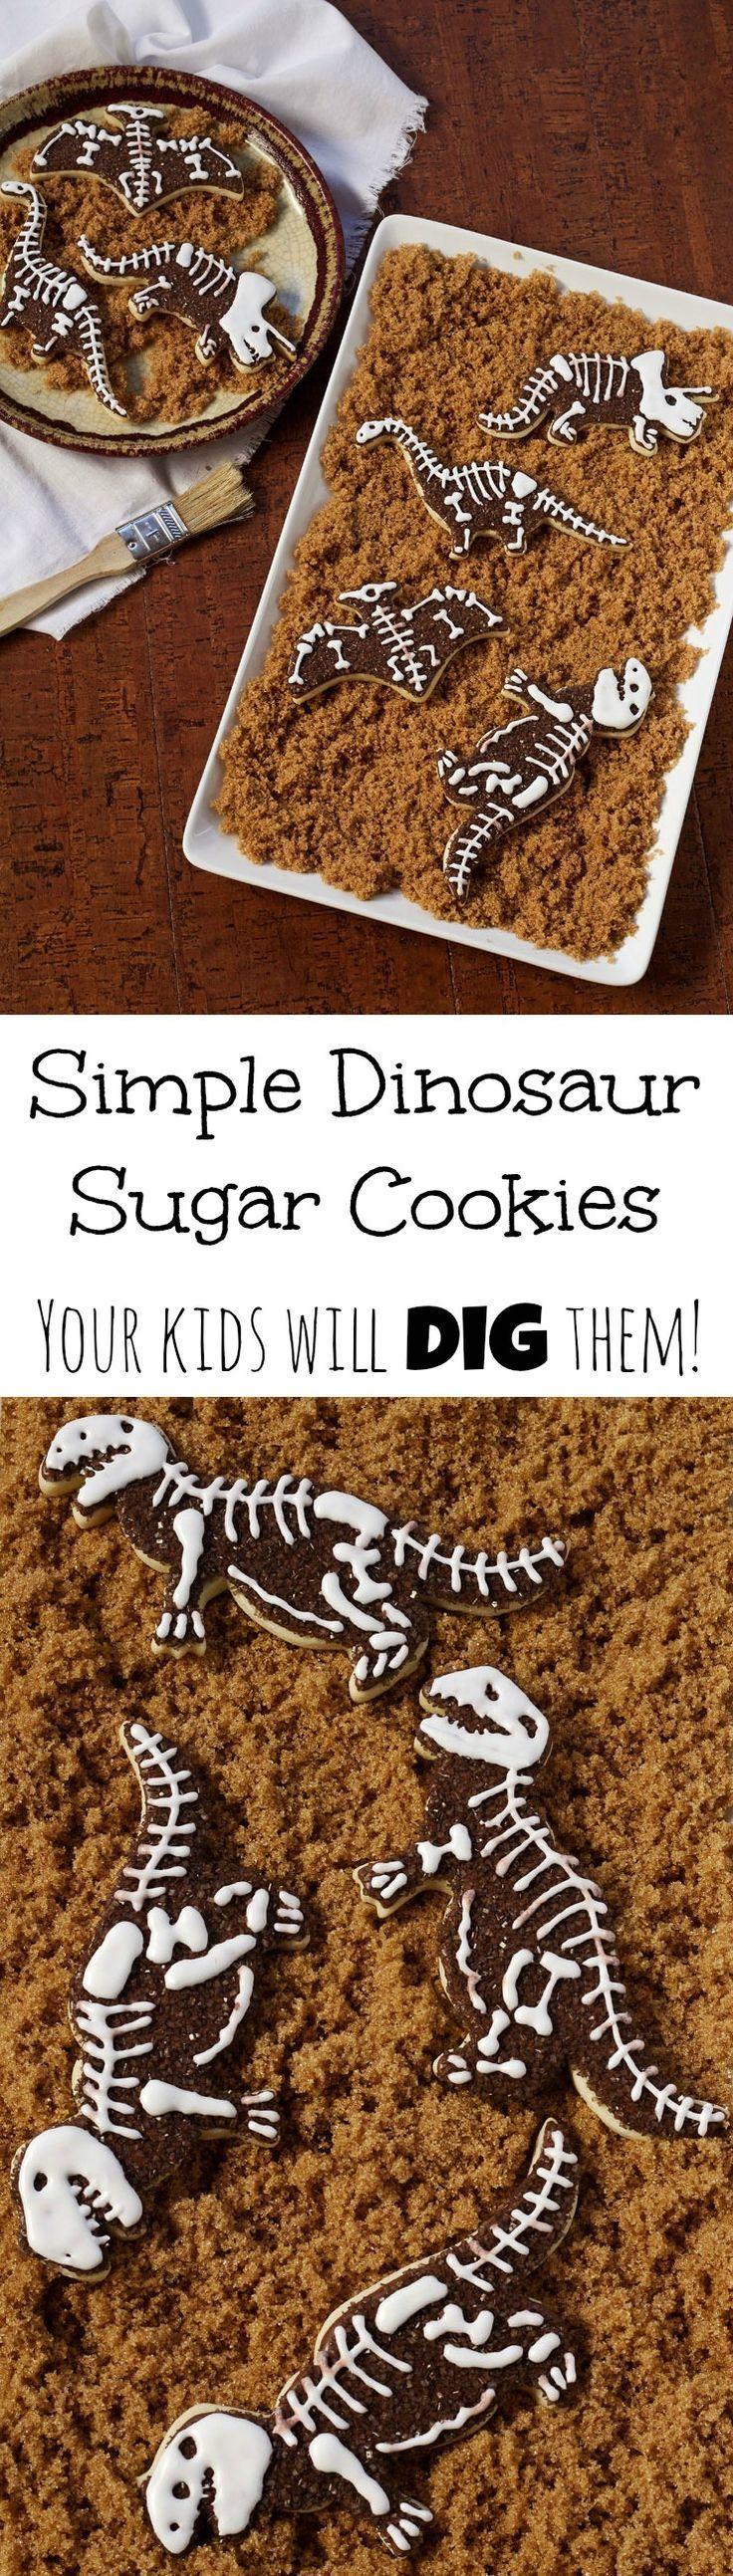 Simple Dinosaur Cookies via http://thebearfootbaker.com